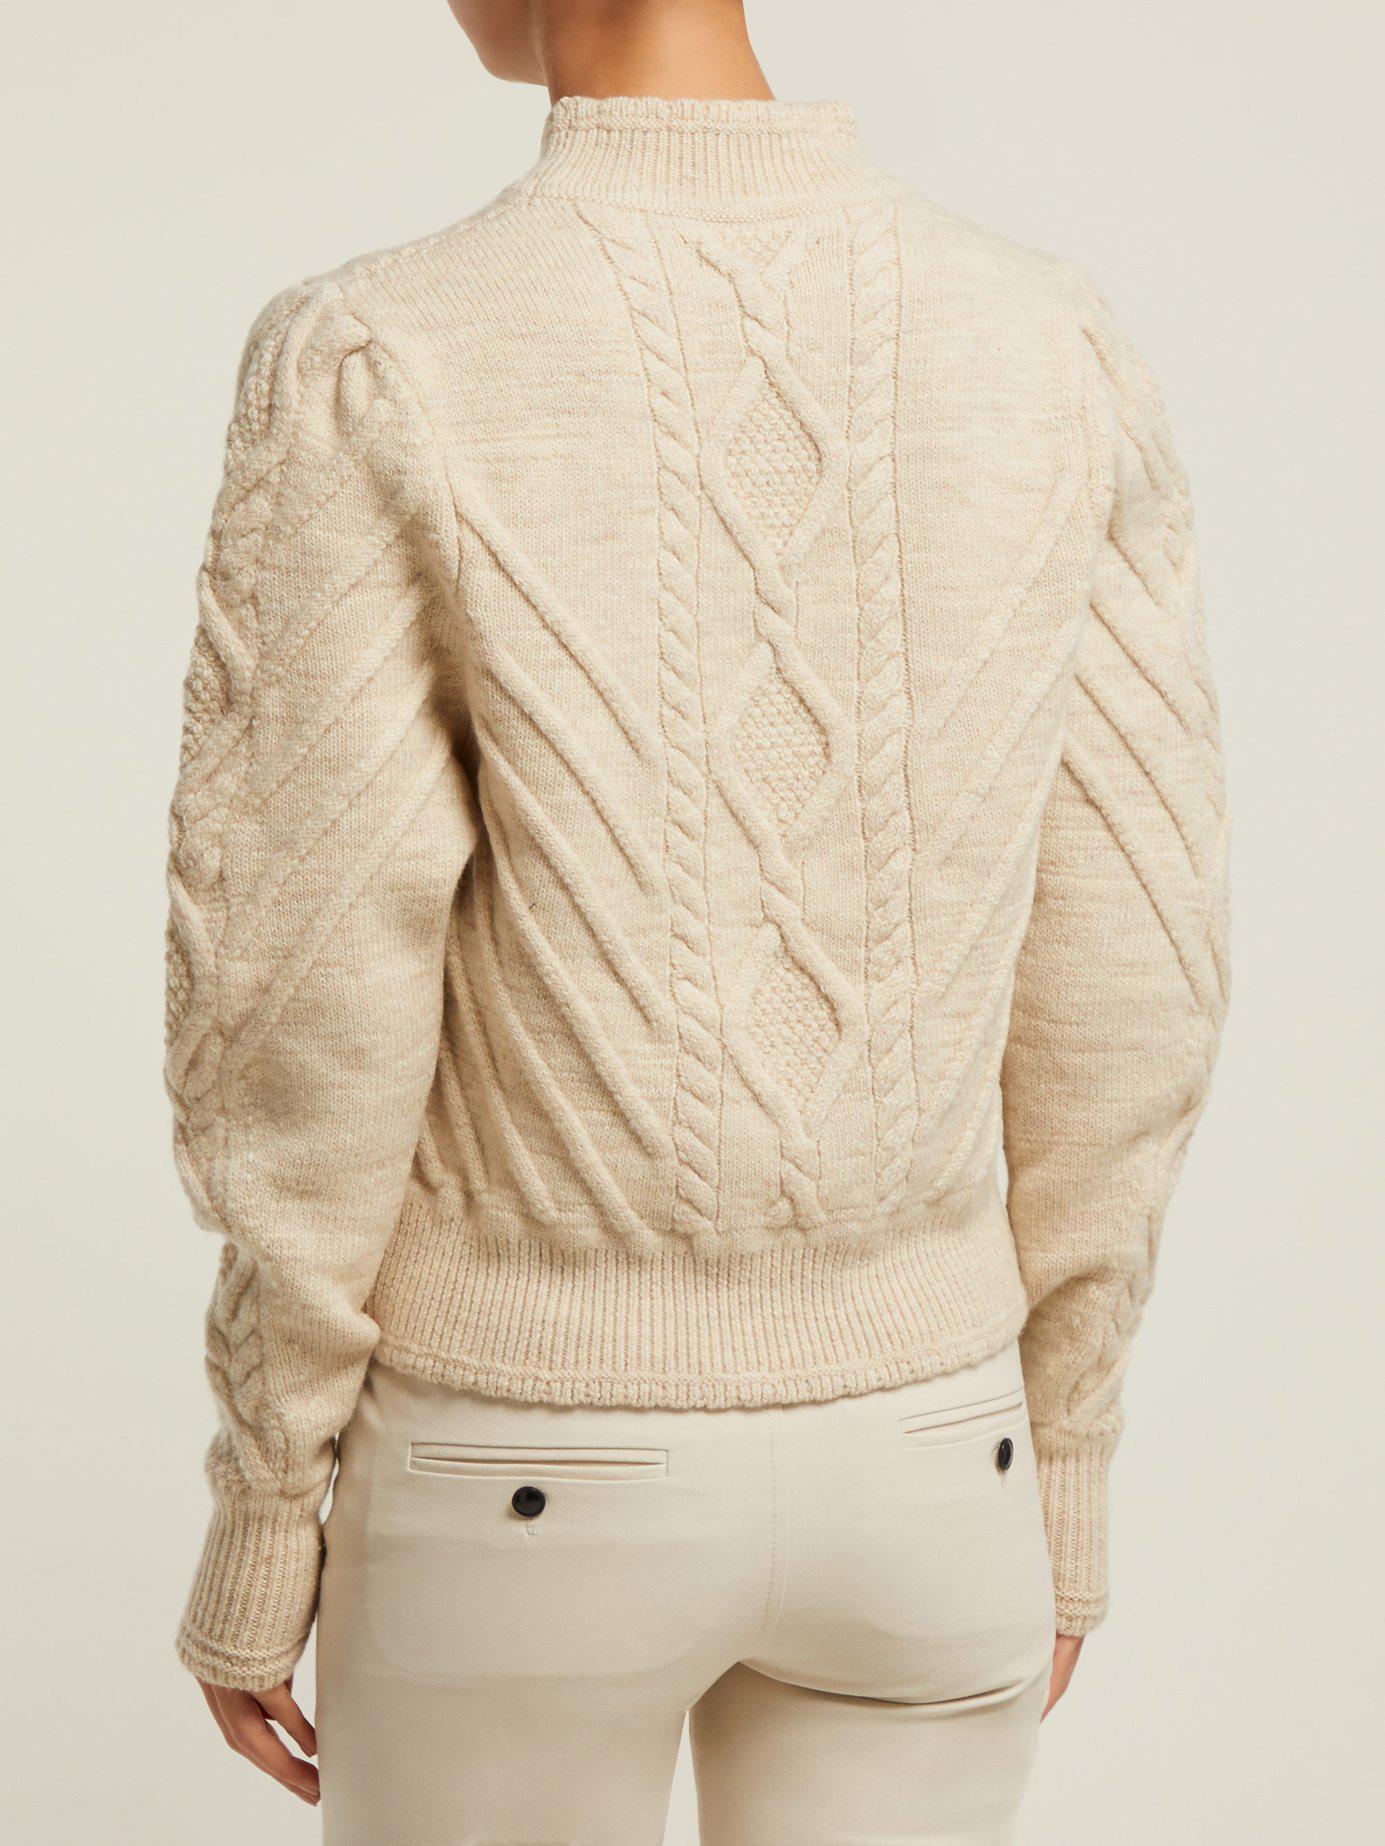 64020d5180 Isabel Marant - White Brantley Aran Knit Wool Blend Sweater - Lyst. View  fullscreen